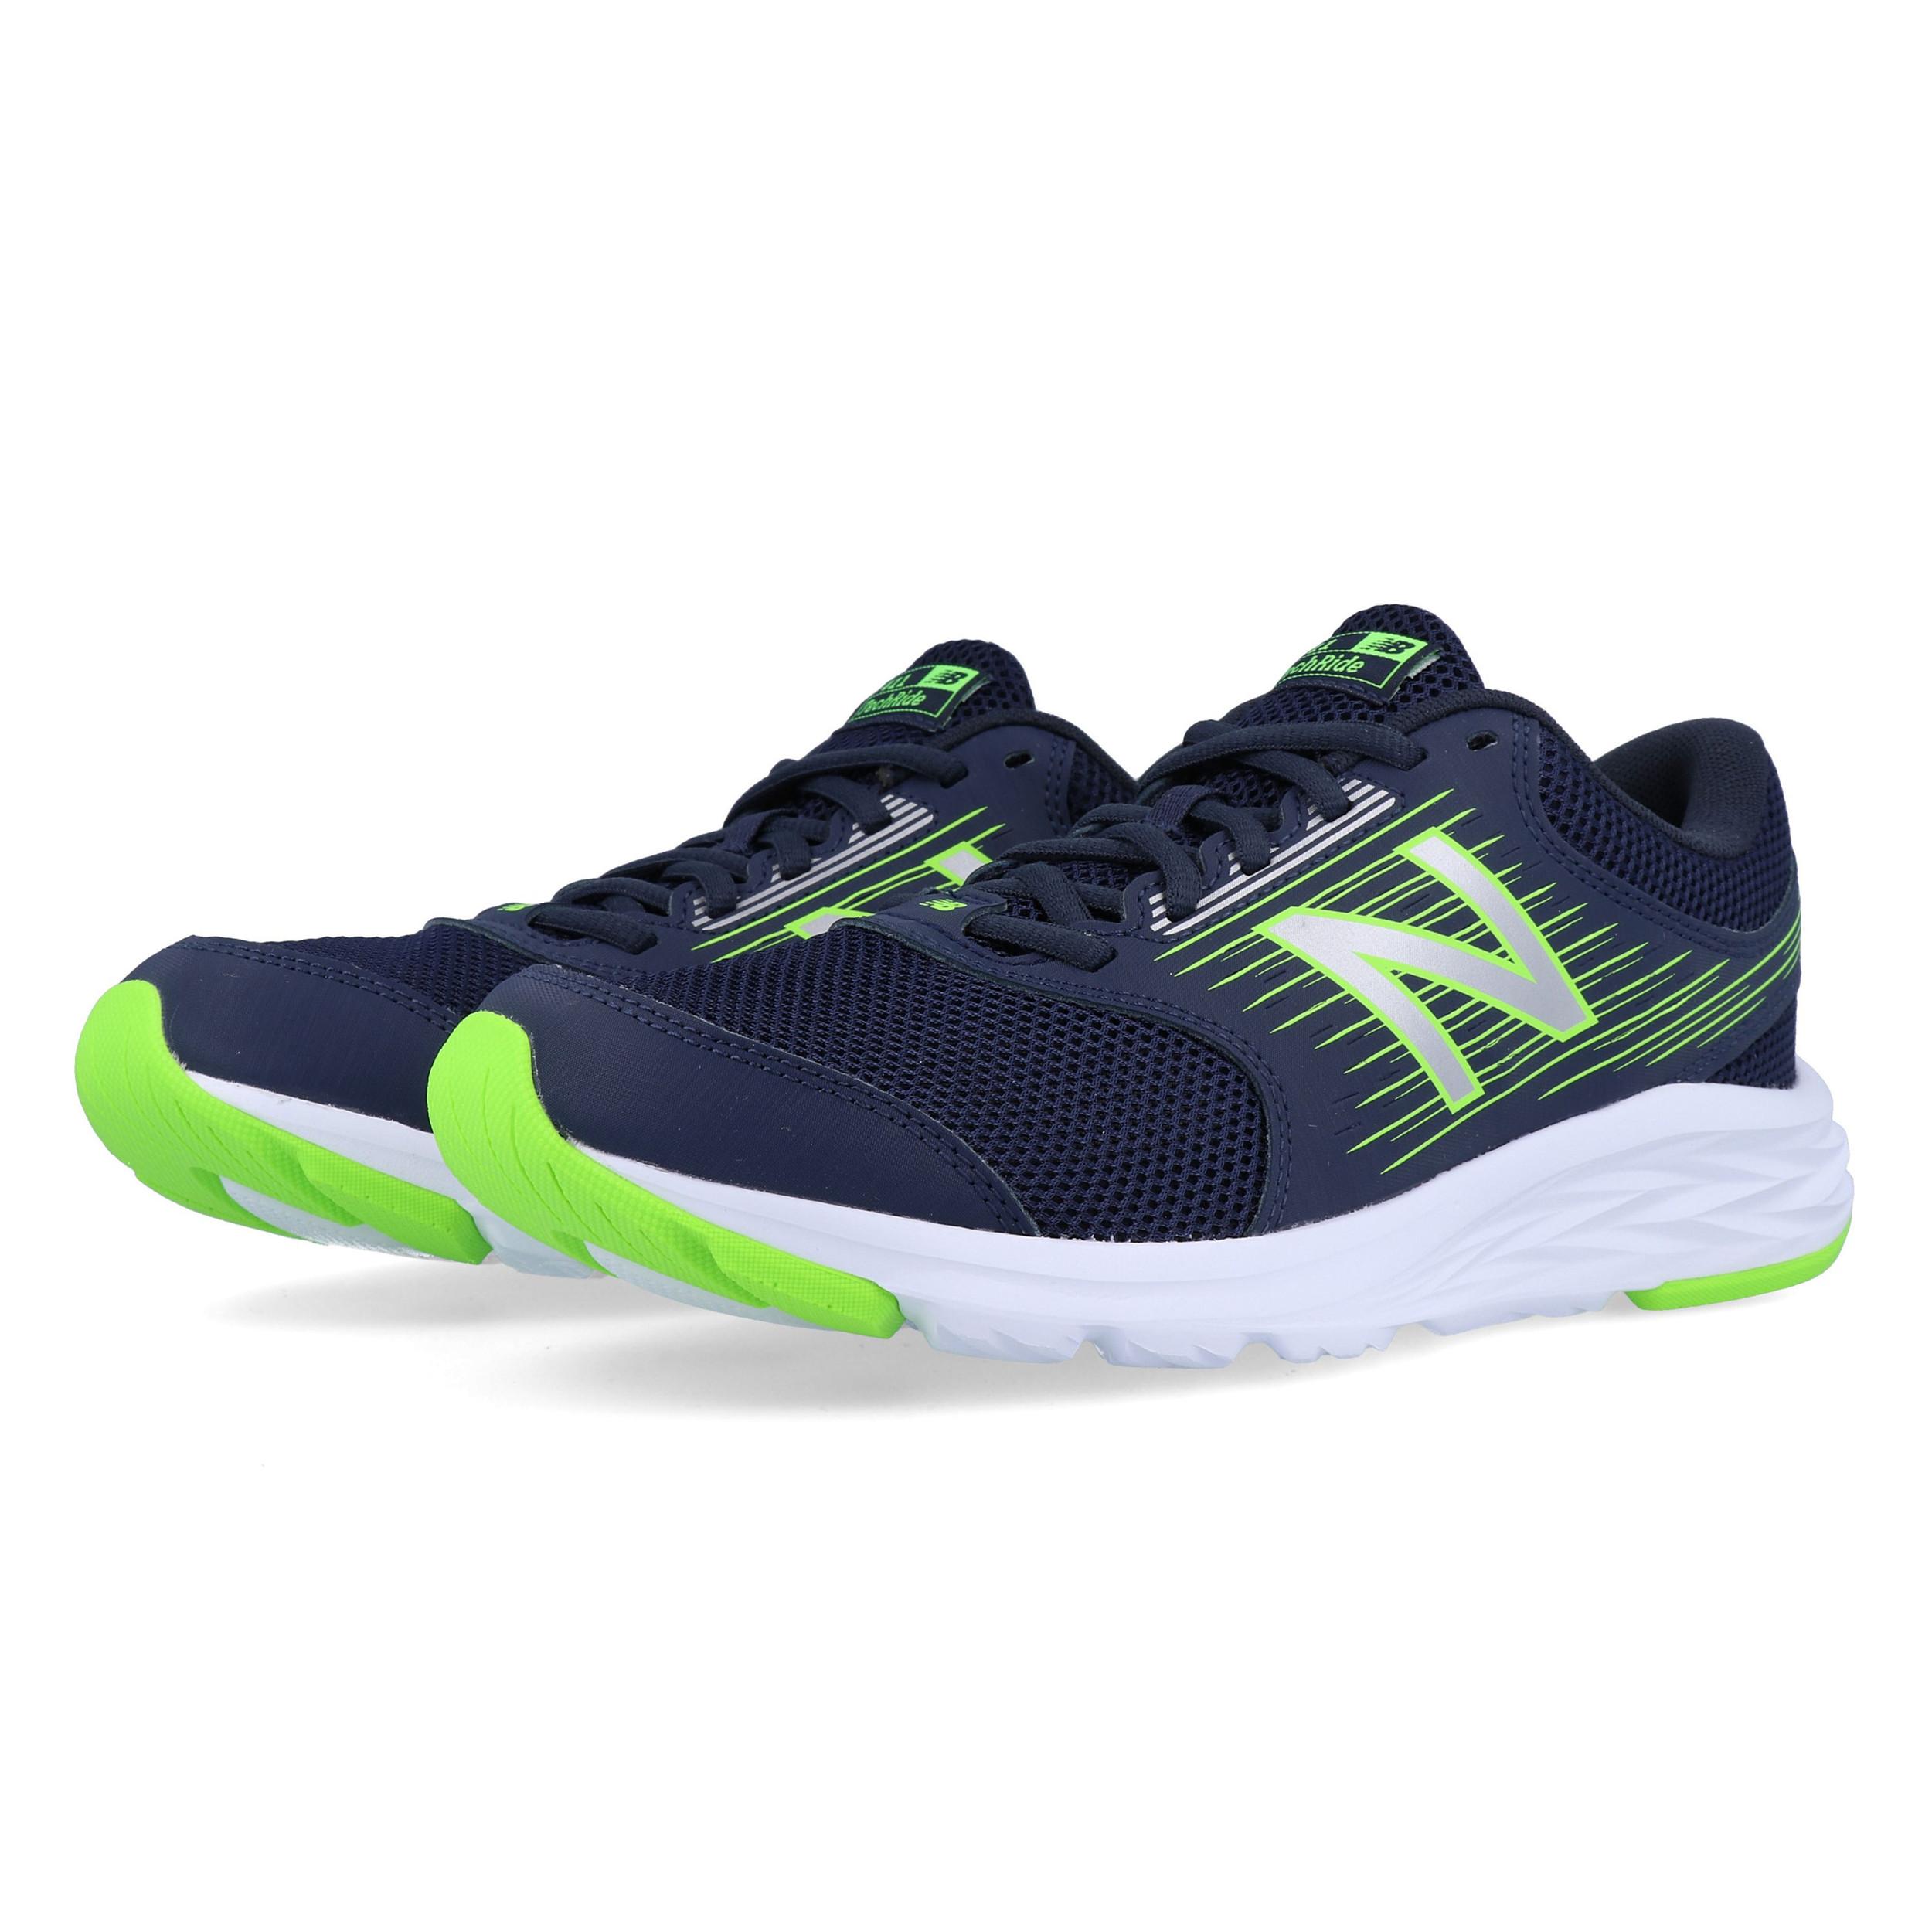 scarpe da ginnastica uomo new balance 2017